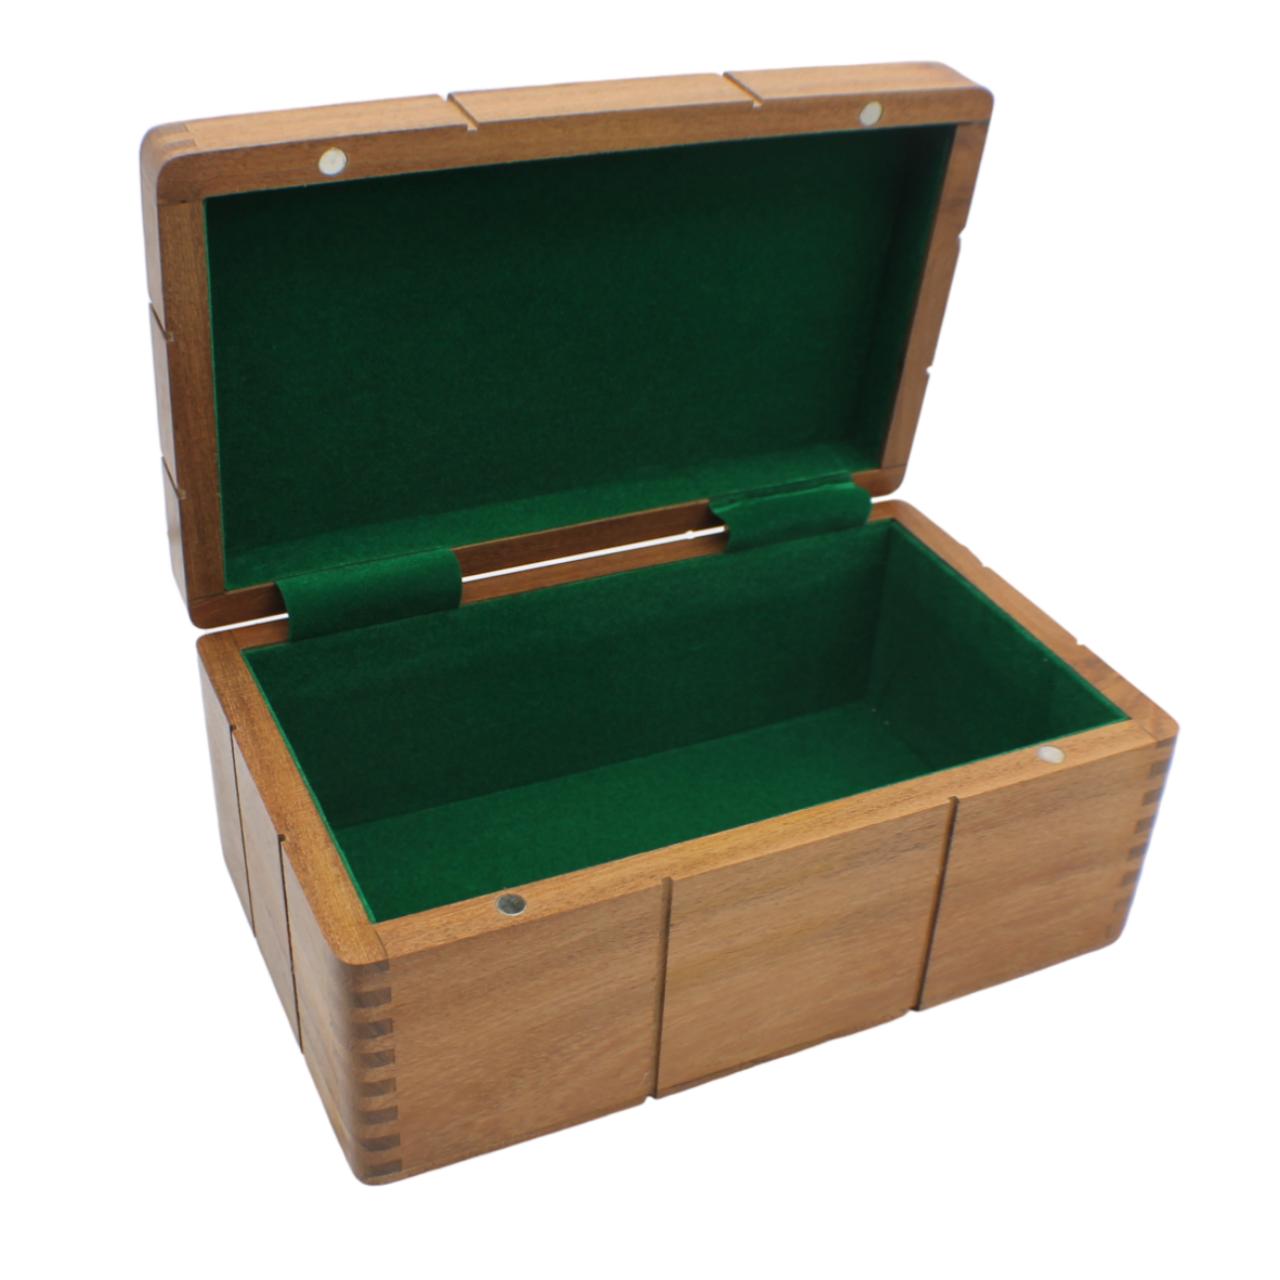 Rex Noir Acacia Chess Storage Box - Medium (BOX-A-85) open